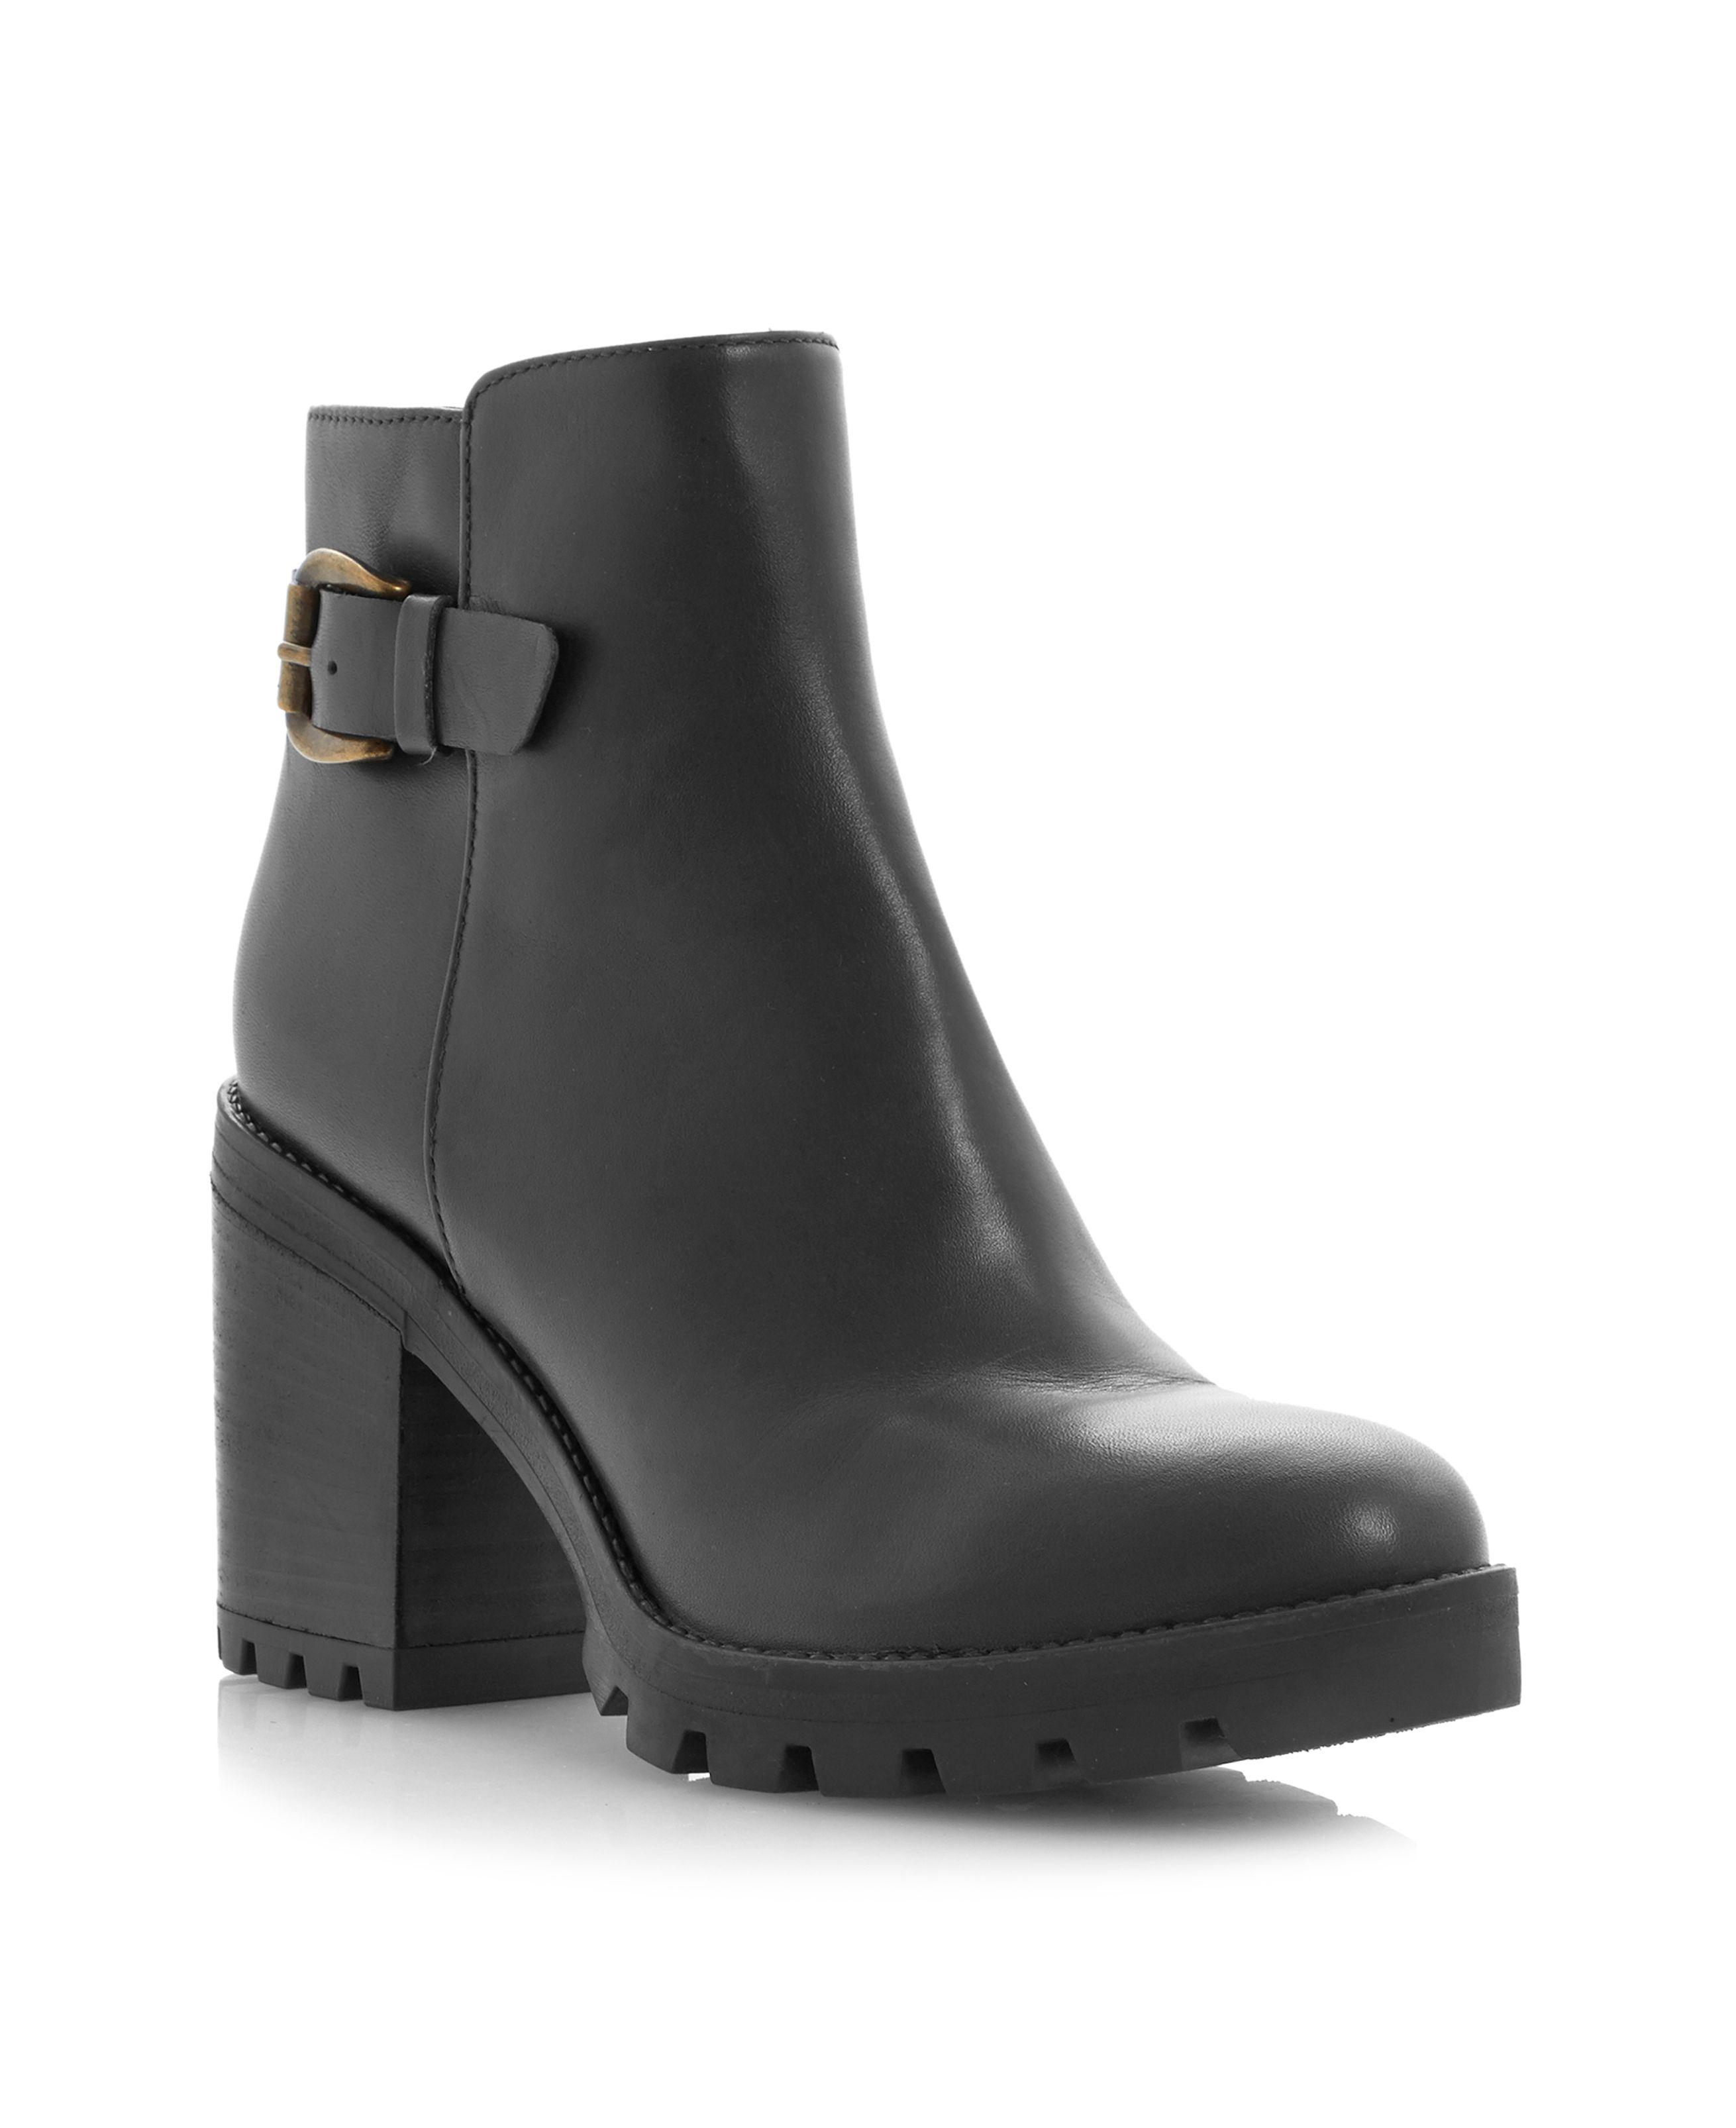 dune black playton ankle boot in black lyst